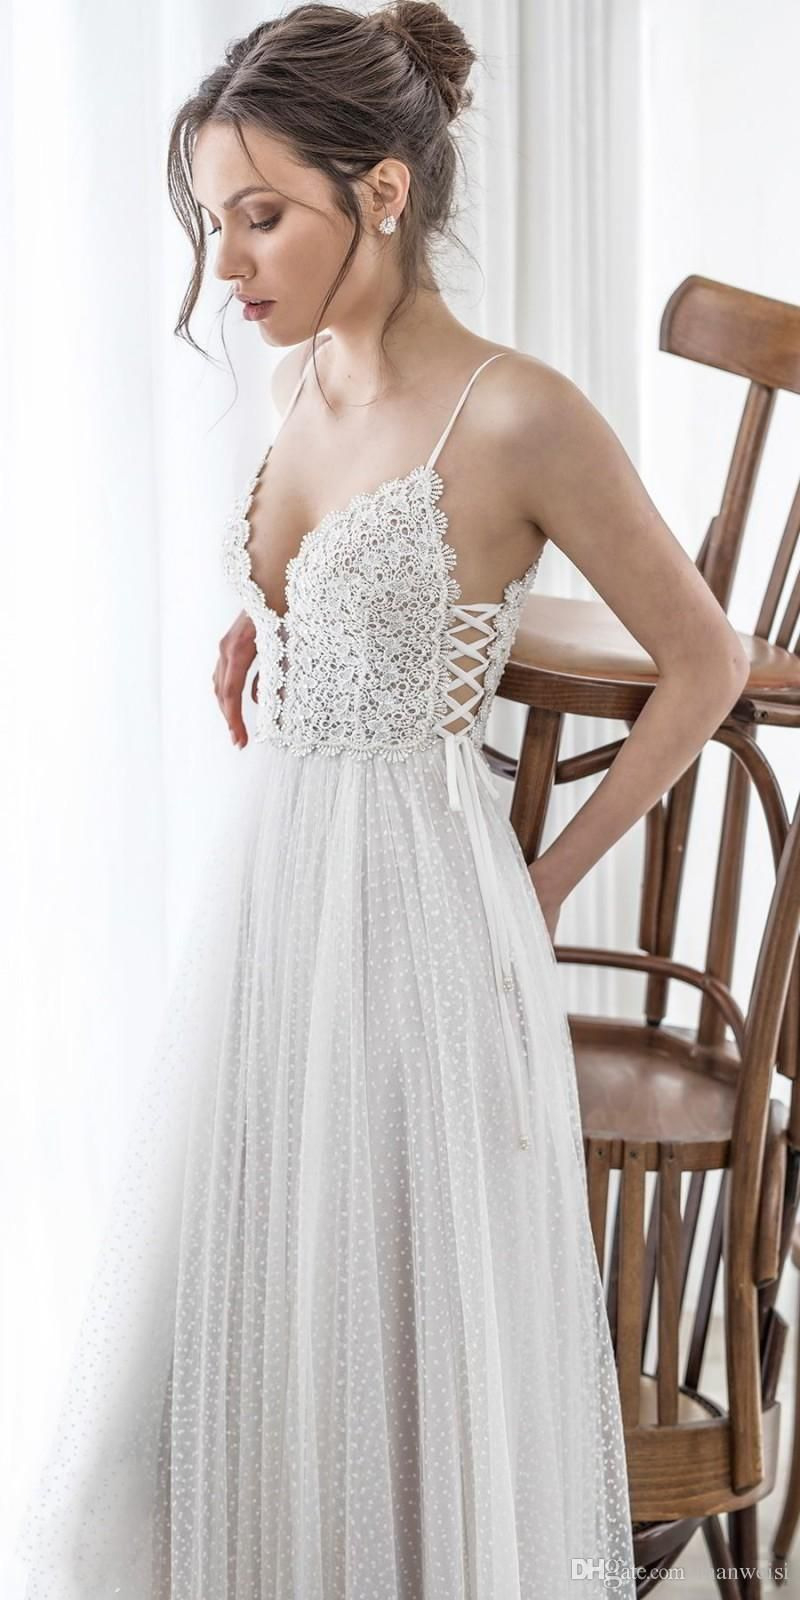 Hochzeitskleid Strand  Hochzeitskleid Strand - Abendkleid